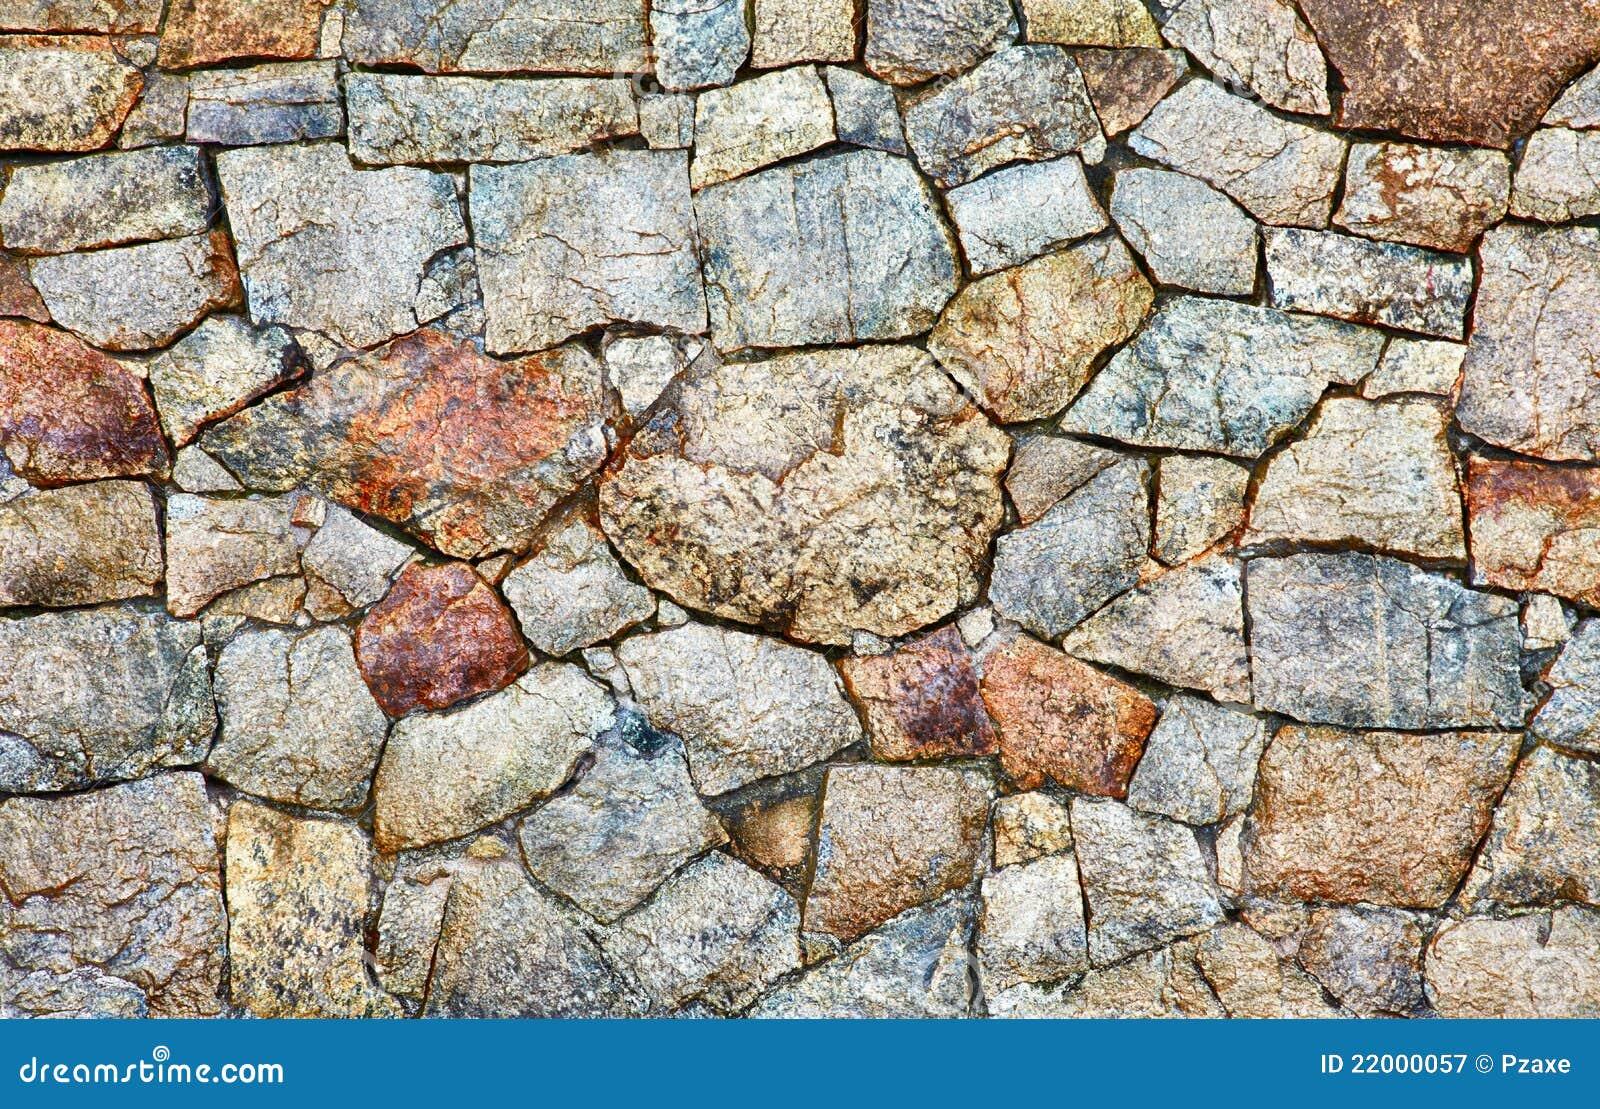 pared de piedra spera natural textura fotografa de archivo libre de regalas